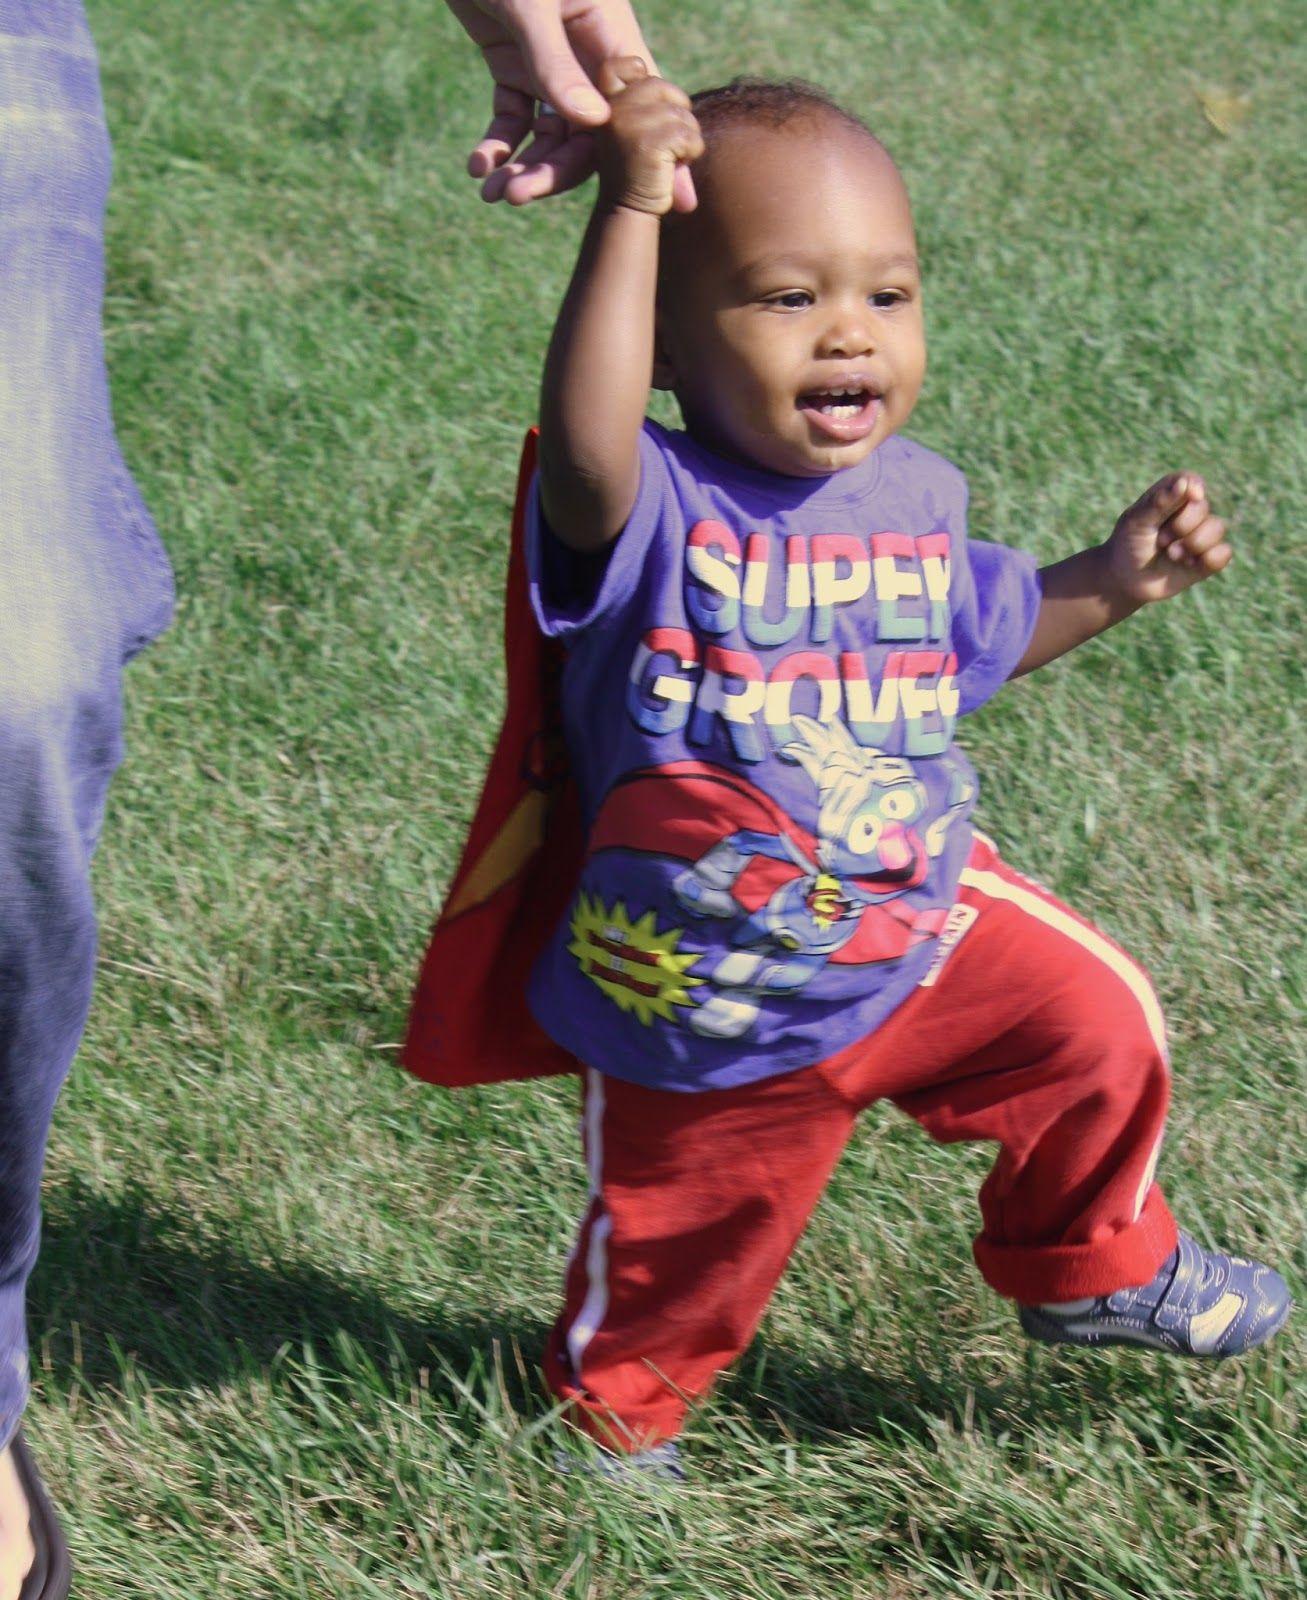 The hard work of raising a super hero!